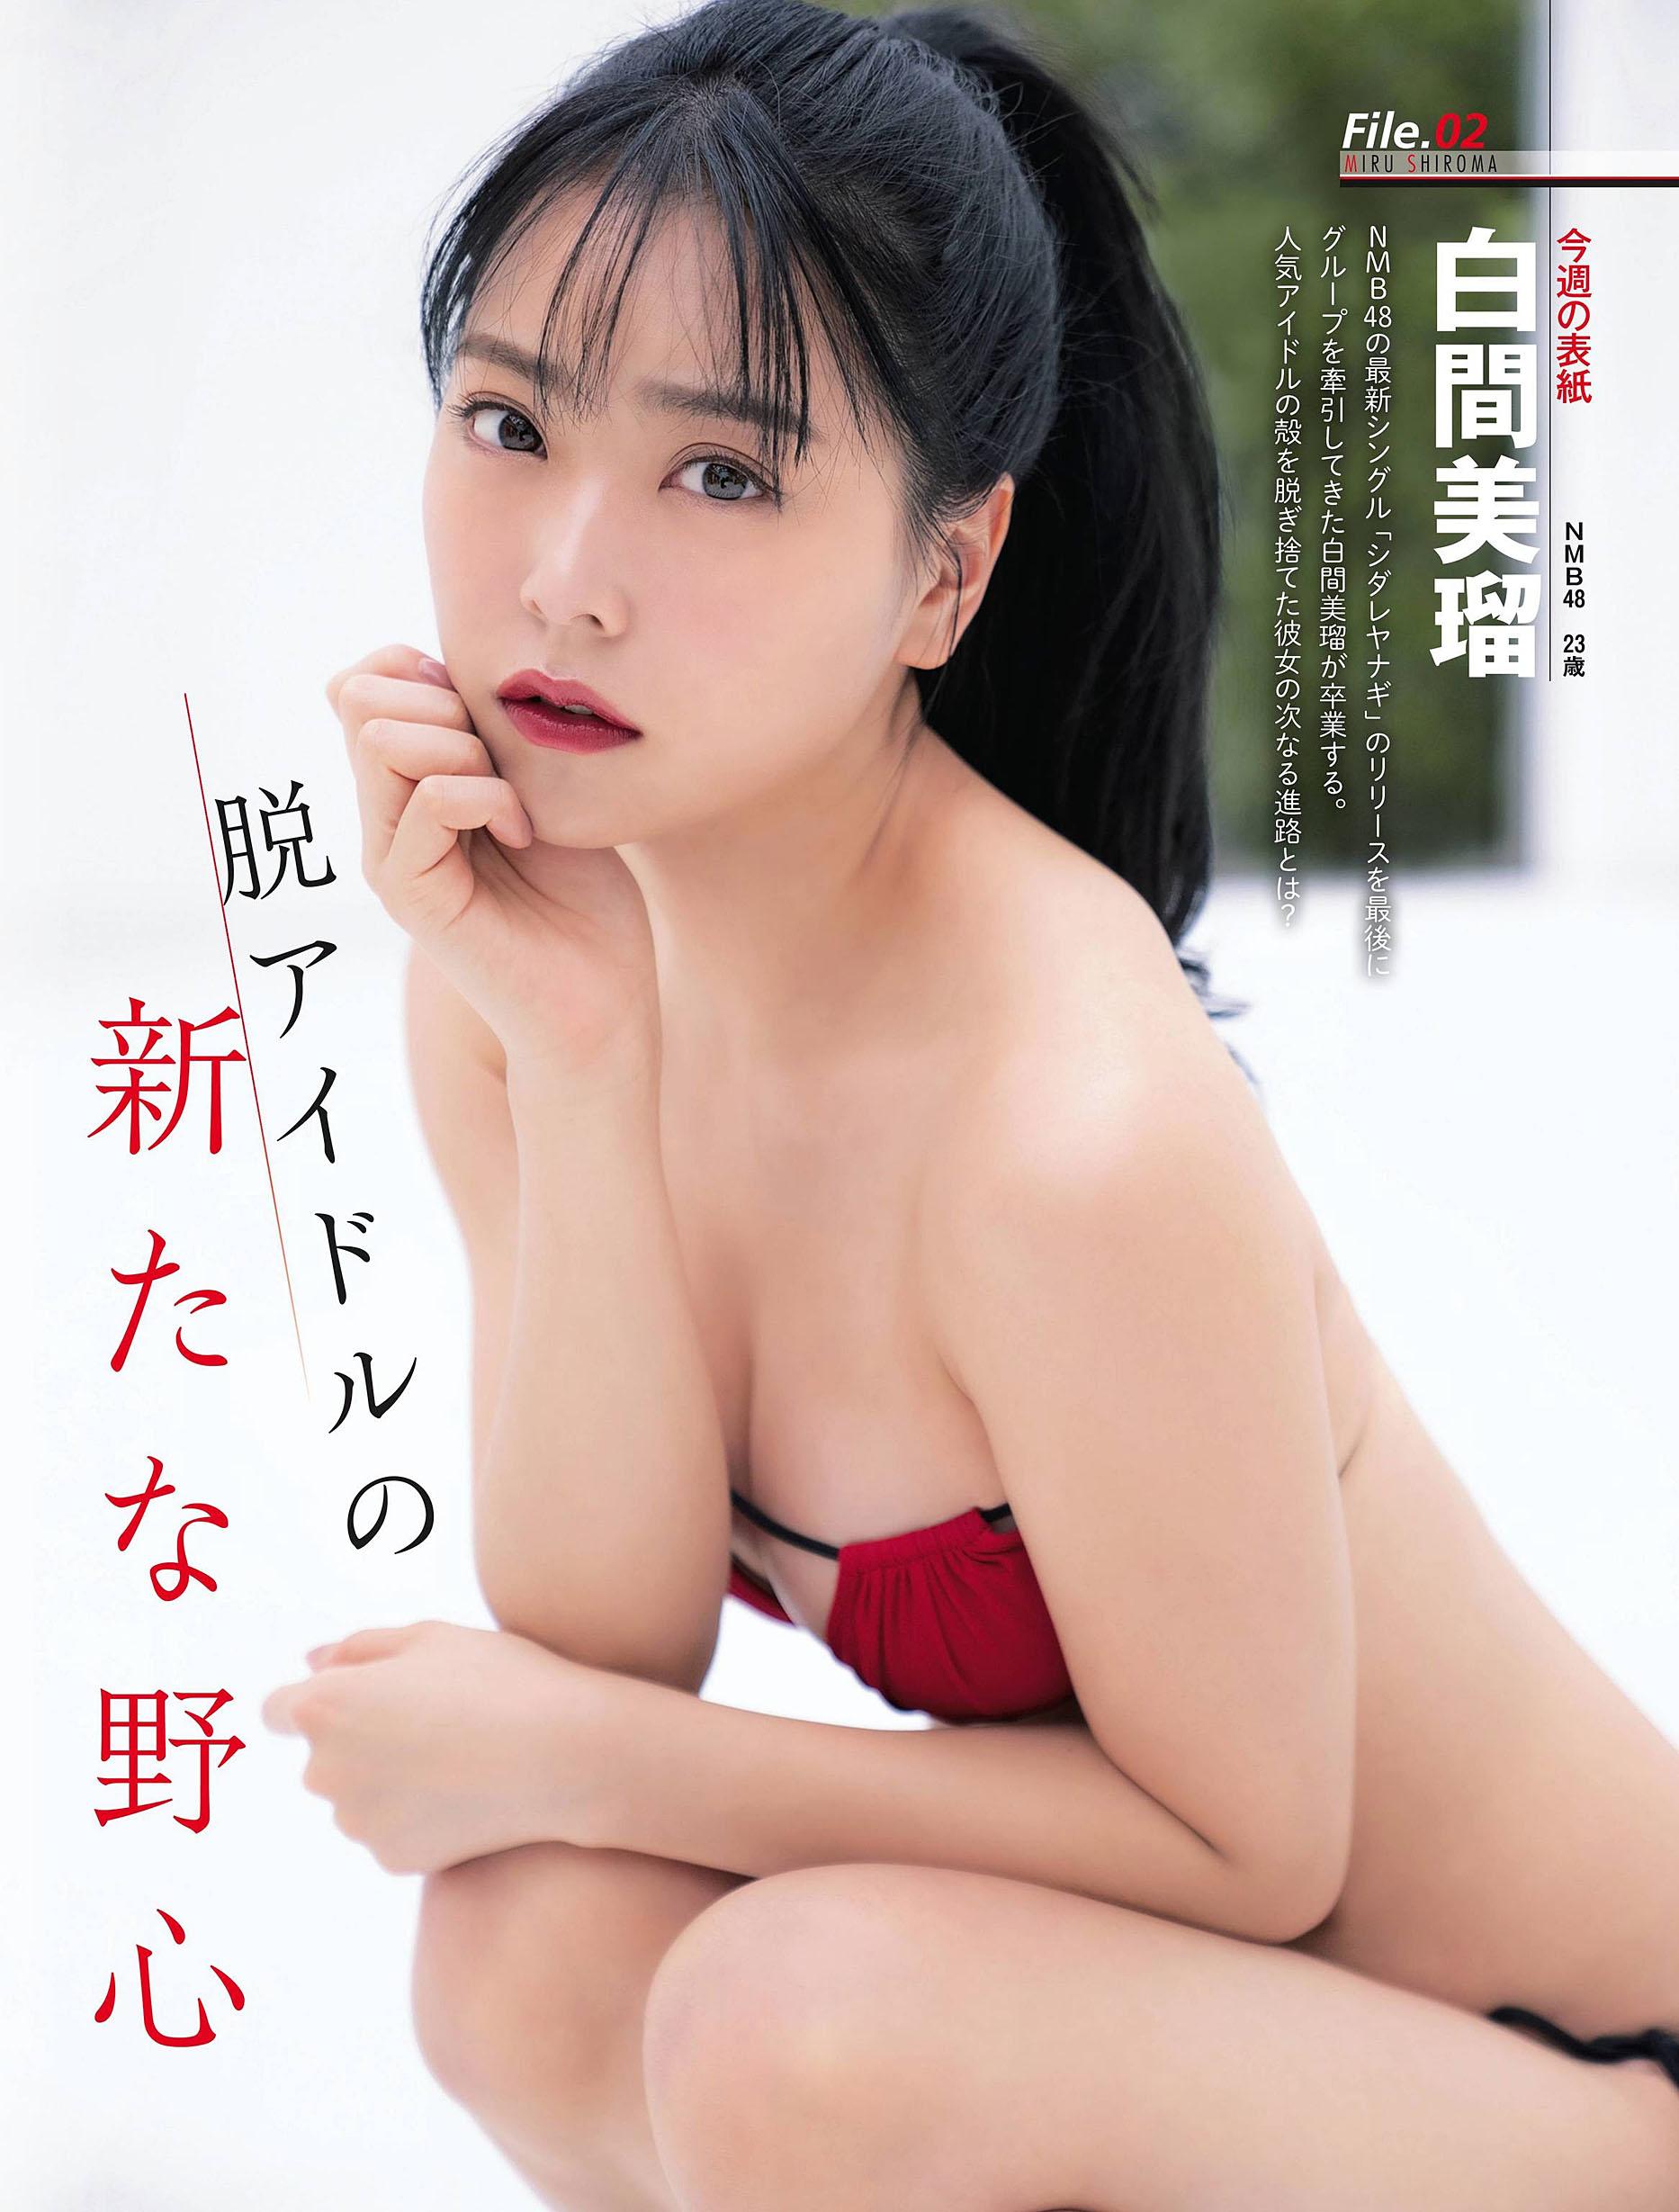 MShiroma Weekly SPA 210518 02.jpg